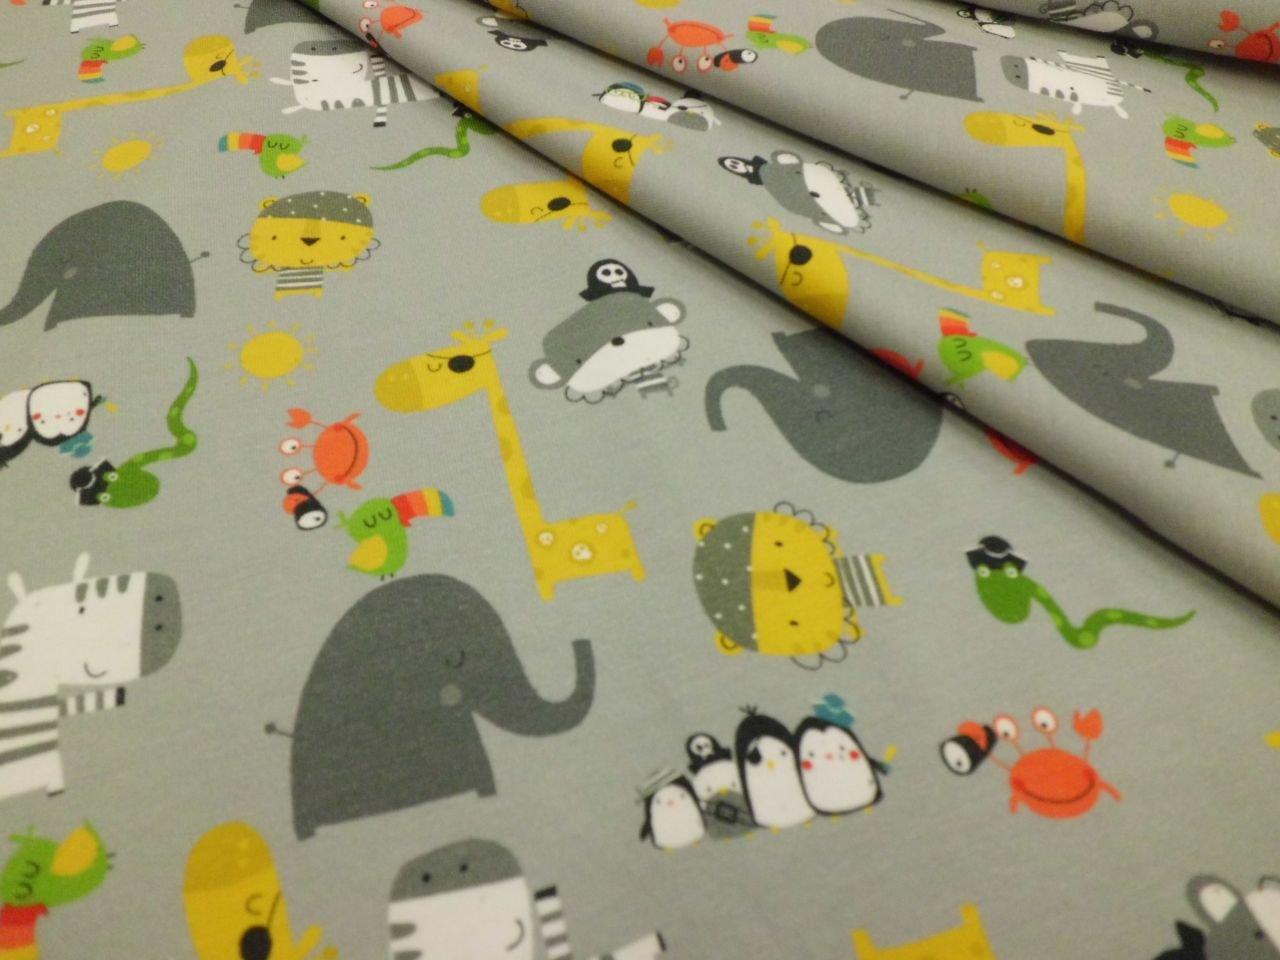 Stof Cotton & Elastane Pirate Animal Print Knit